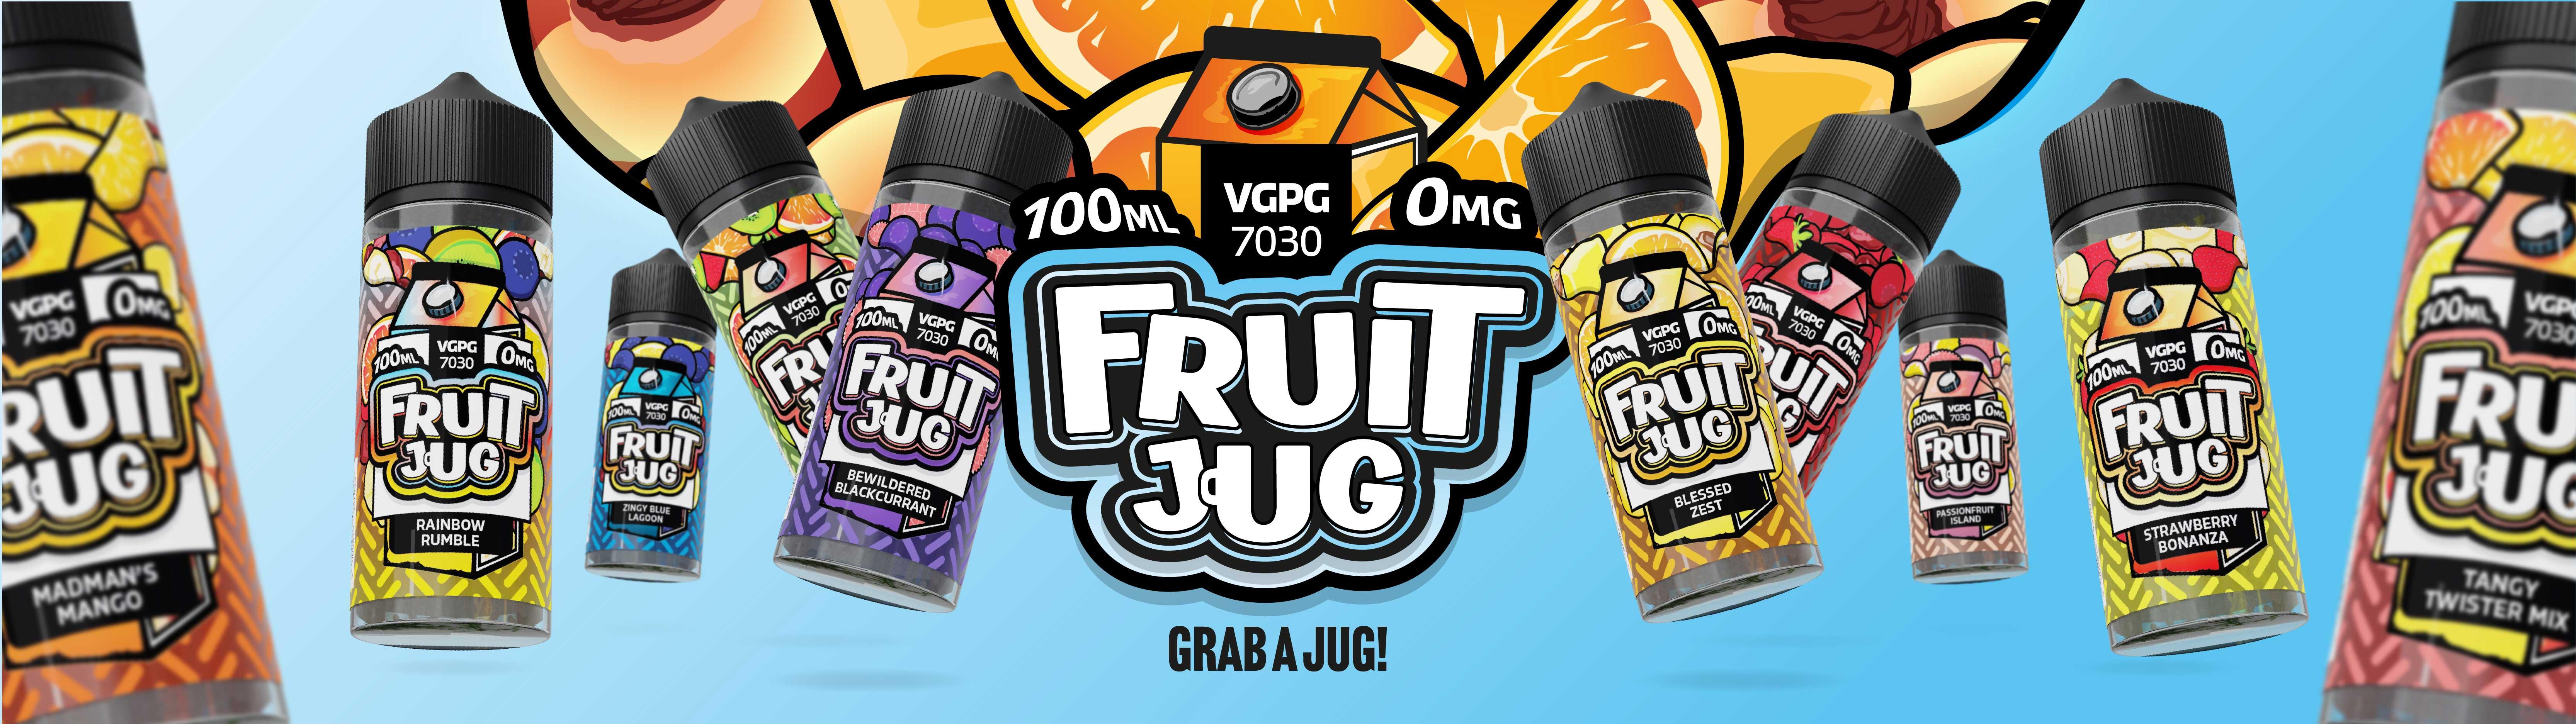 Fruit Jug